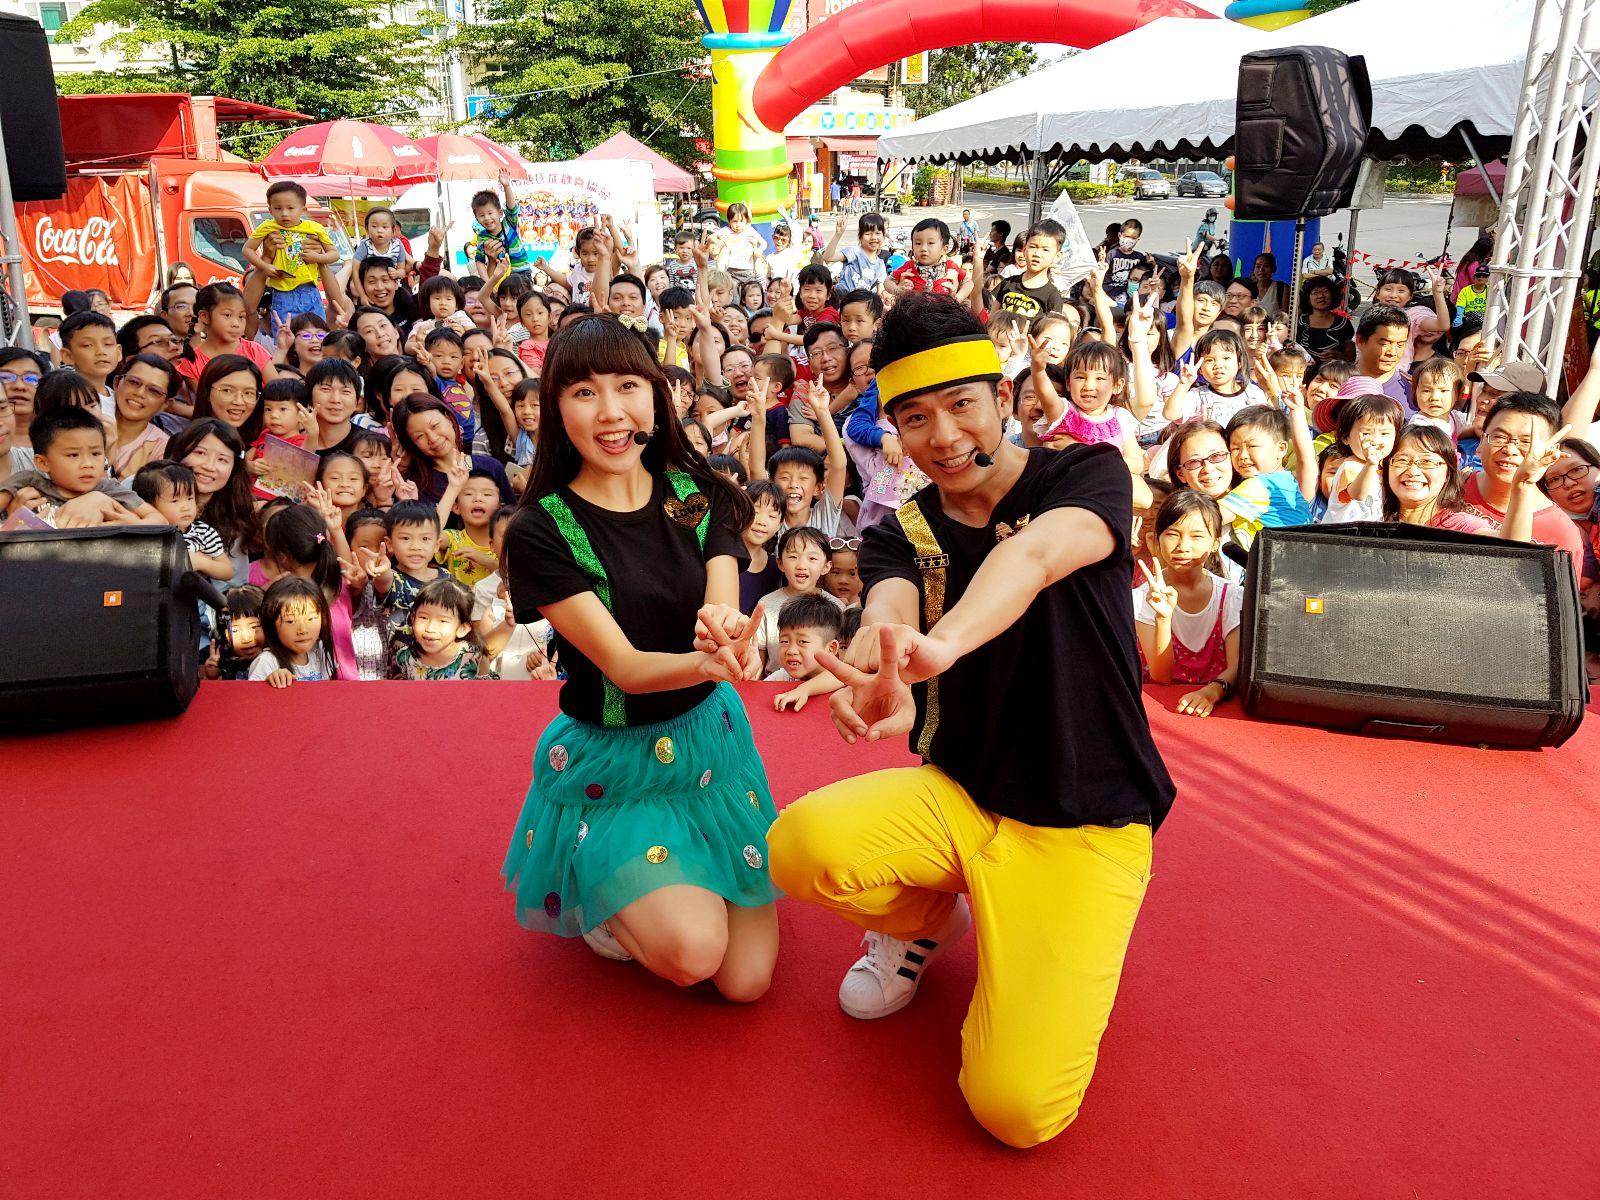 YOYO 親子台的KIWI姐姐(左)與香蕉哥哥 (右)。